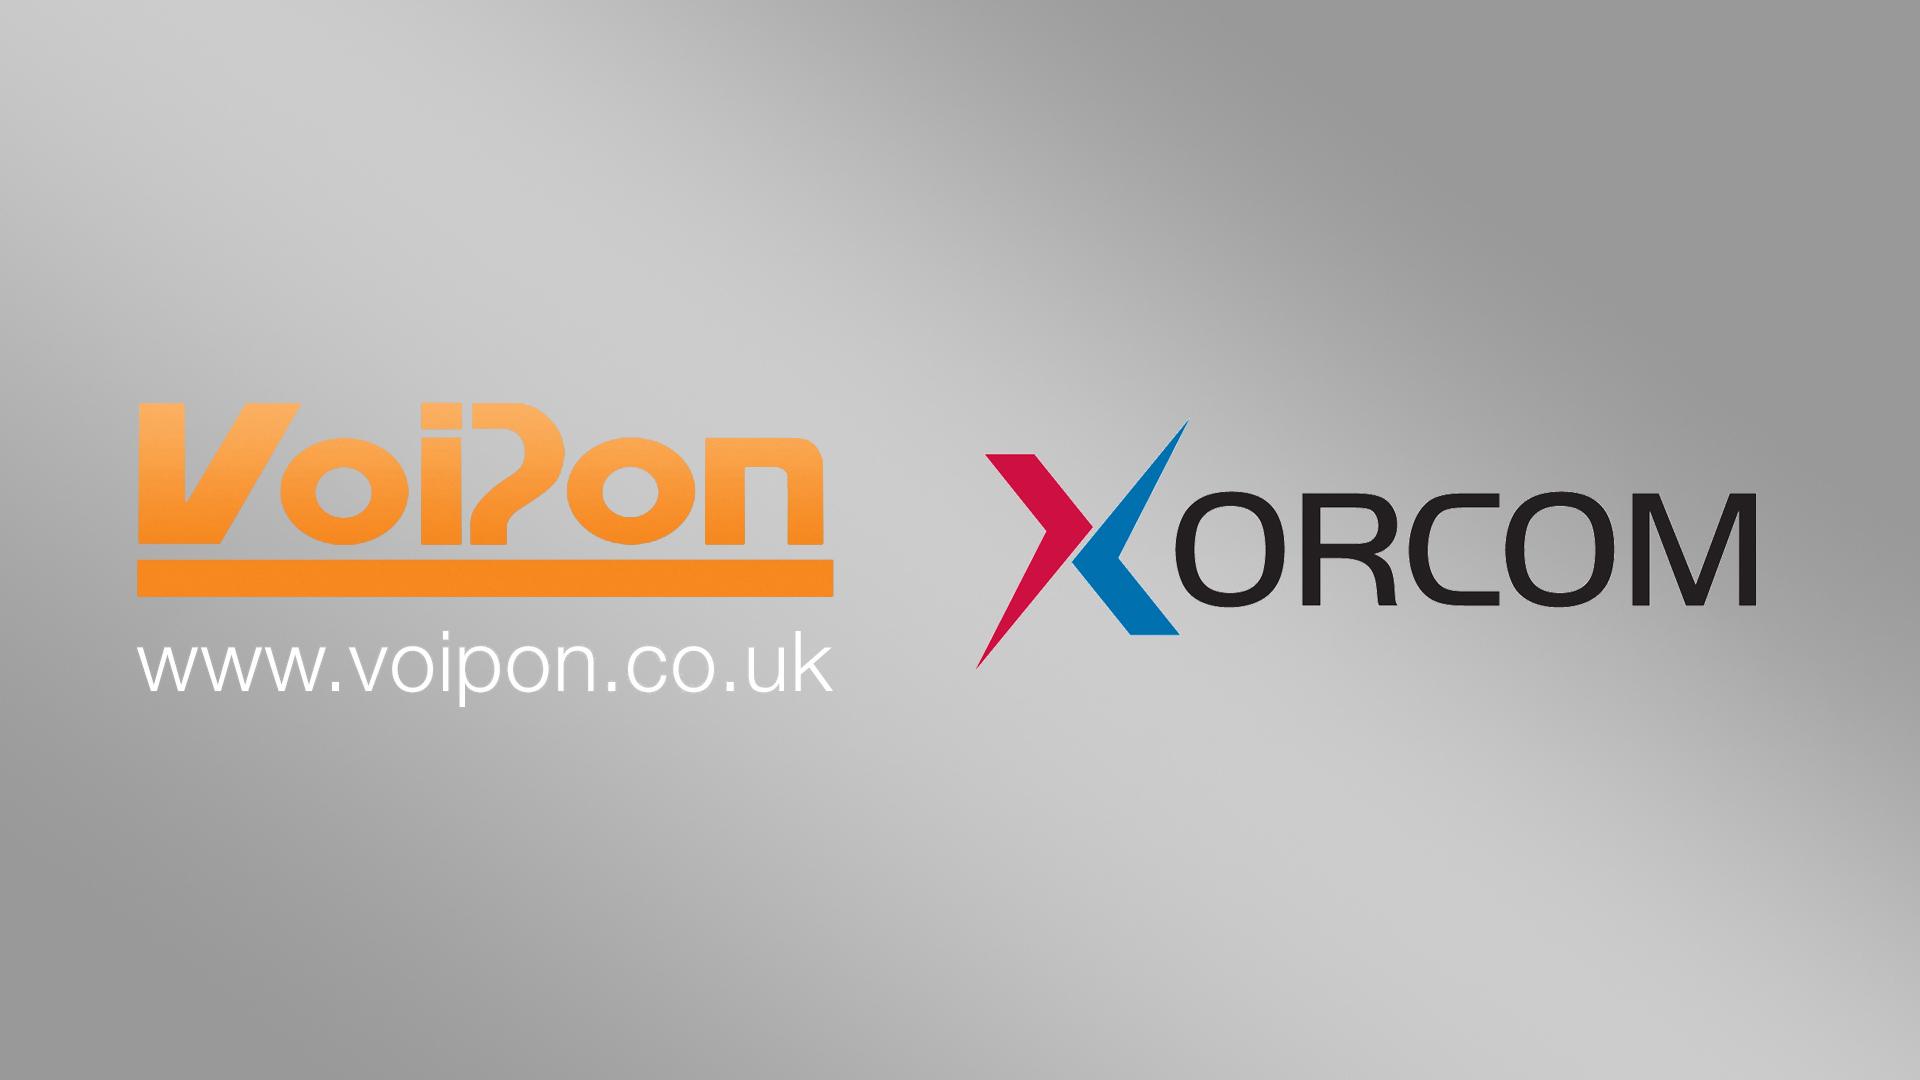 VoIPon interview Xorcom on the Xorcom Blue Steel range, Xorcom-Surf Alliance + what's new at Xorcom